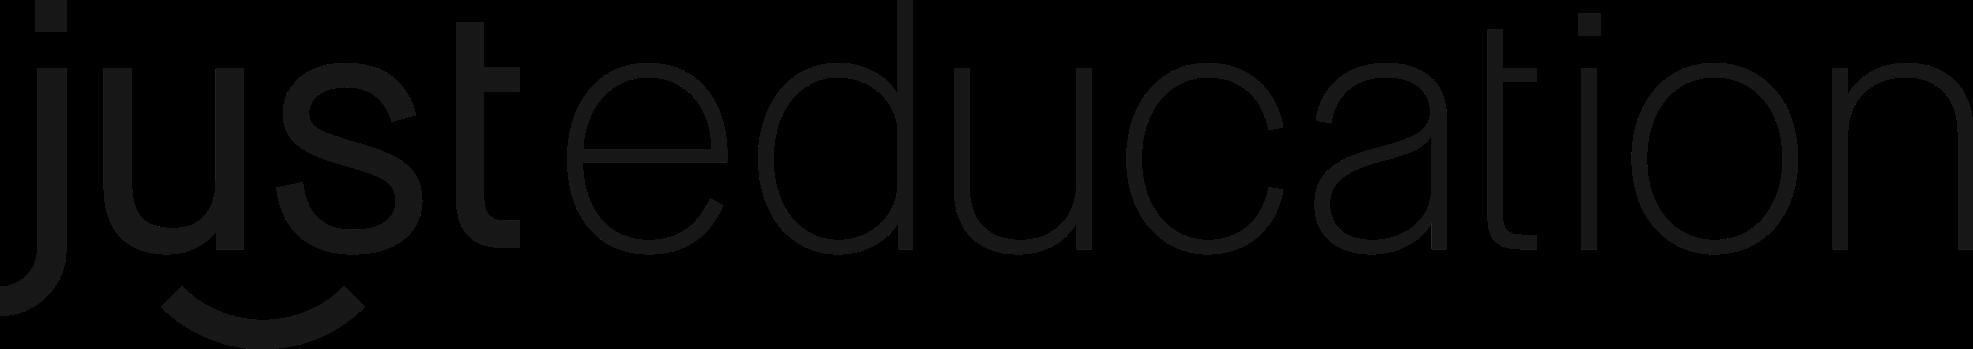 Just education logo, black text